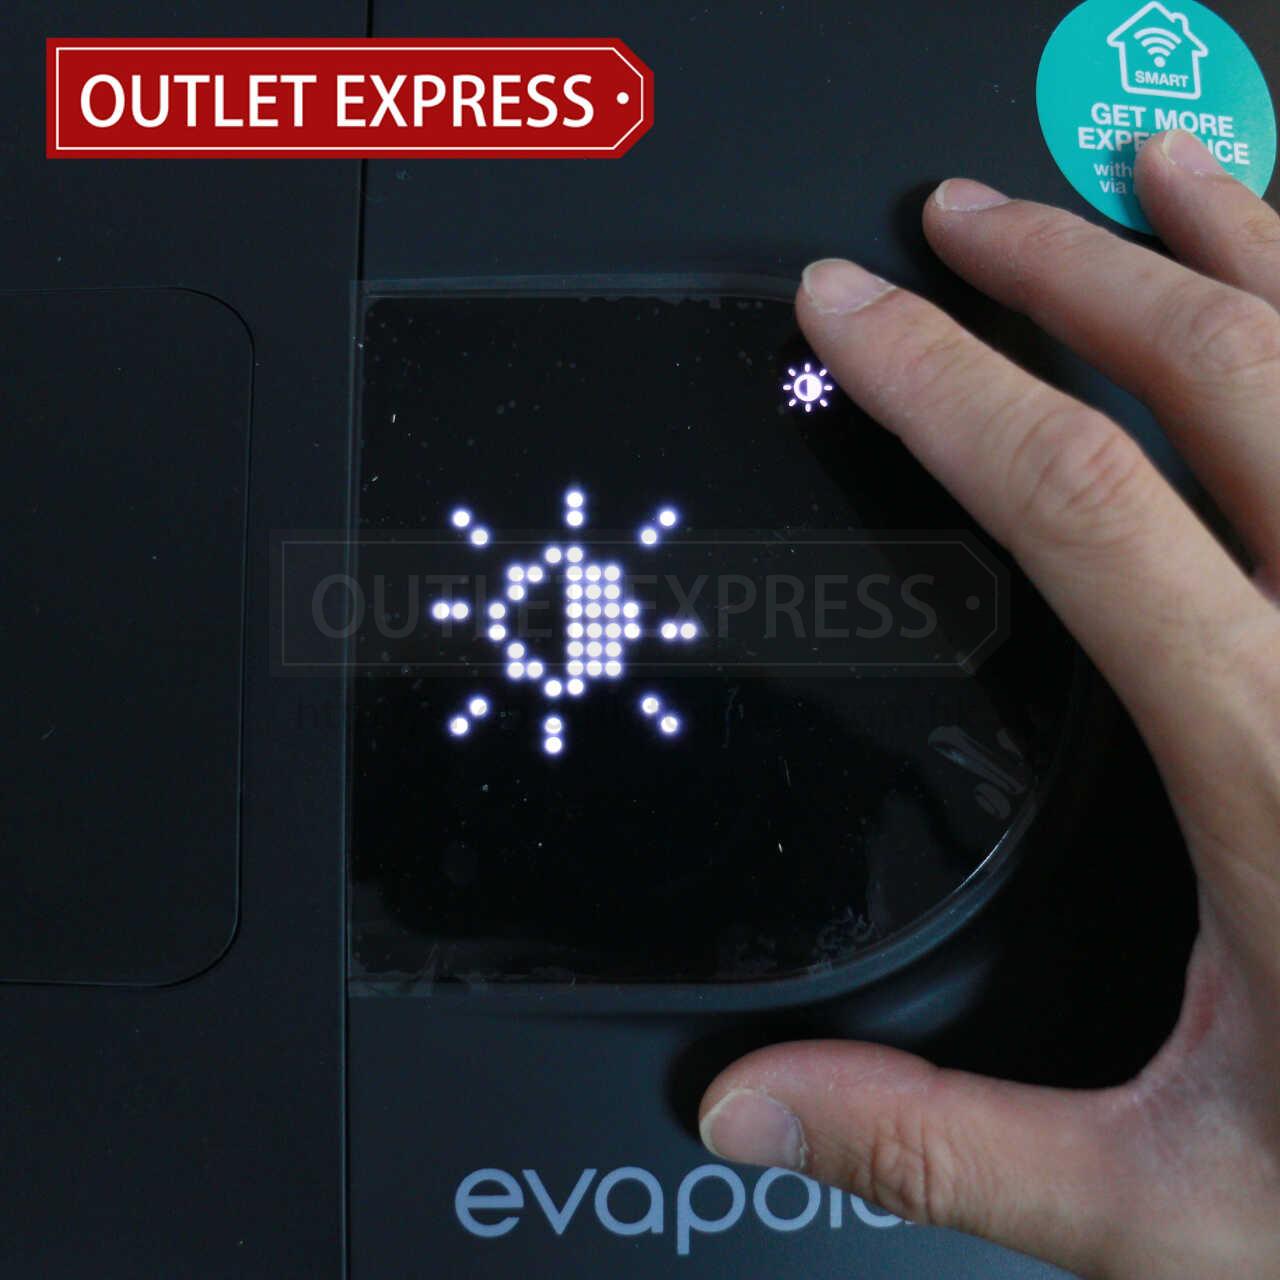 Evapolar 二代小型個人流動冷氣機 (evaSMART EV-3000) | 智能水冷風機 ( 現貨發售 ) | 香港行貨 光間度- Outlet Express HK生活百貨城實拍相片